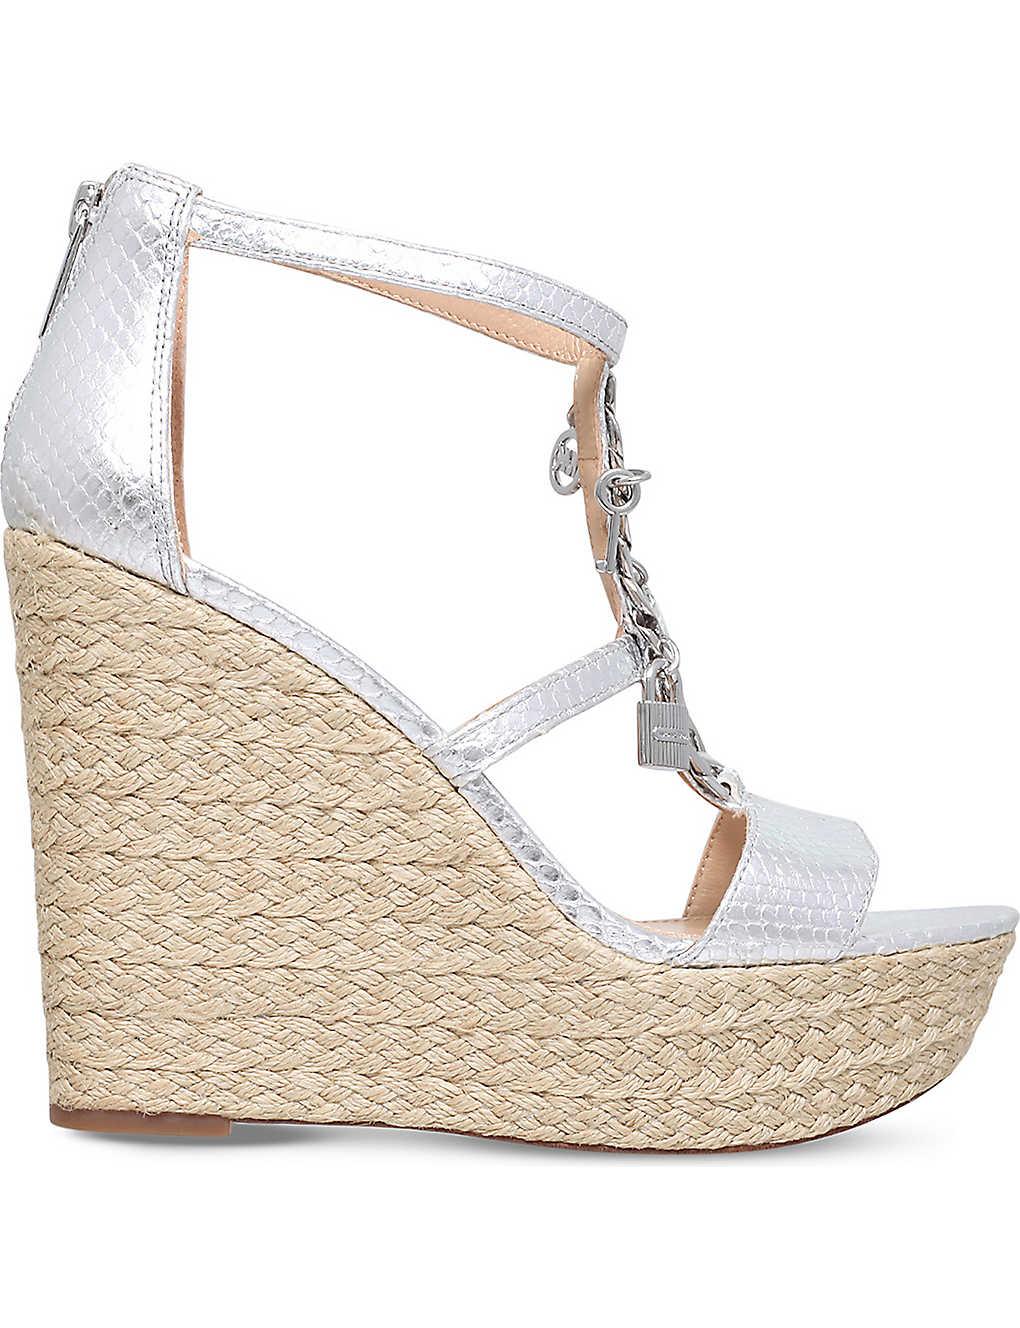 6377a5654aa1b MICHAEL MICHAEL KORS - Suki metallic-leather platform sandals ...